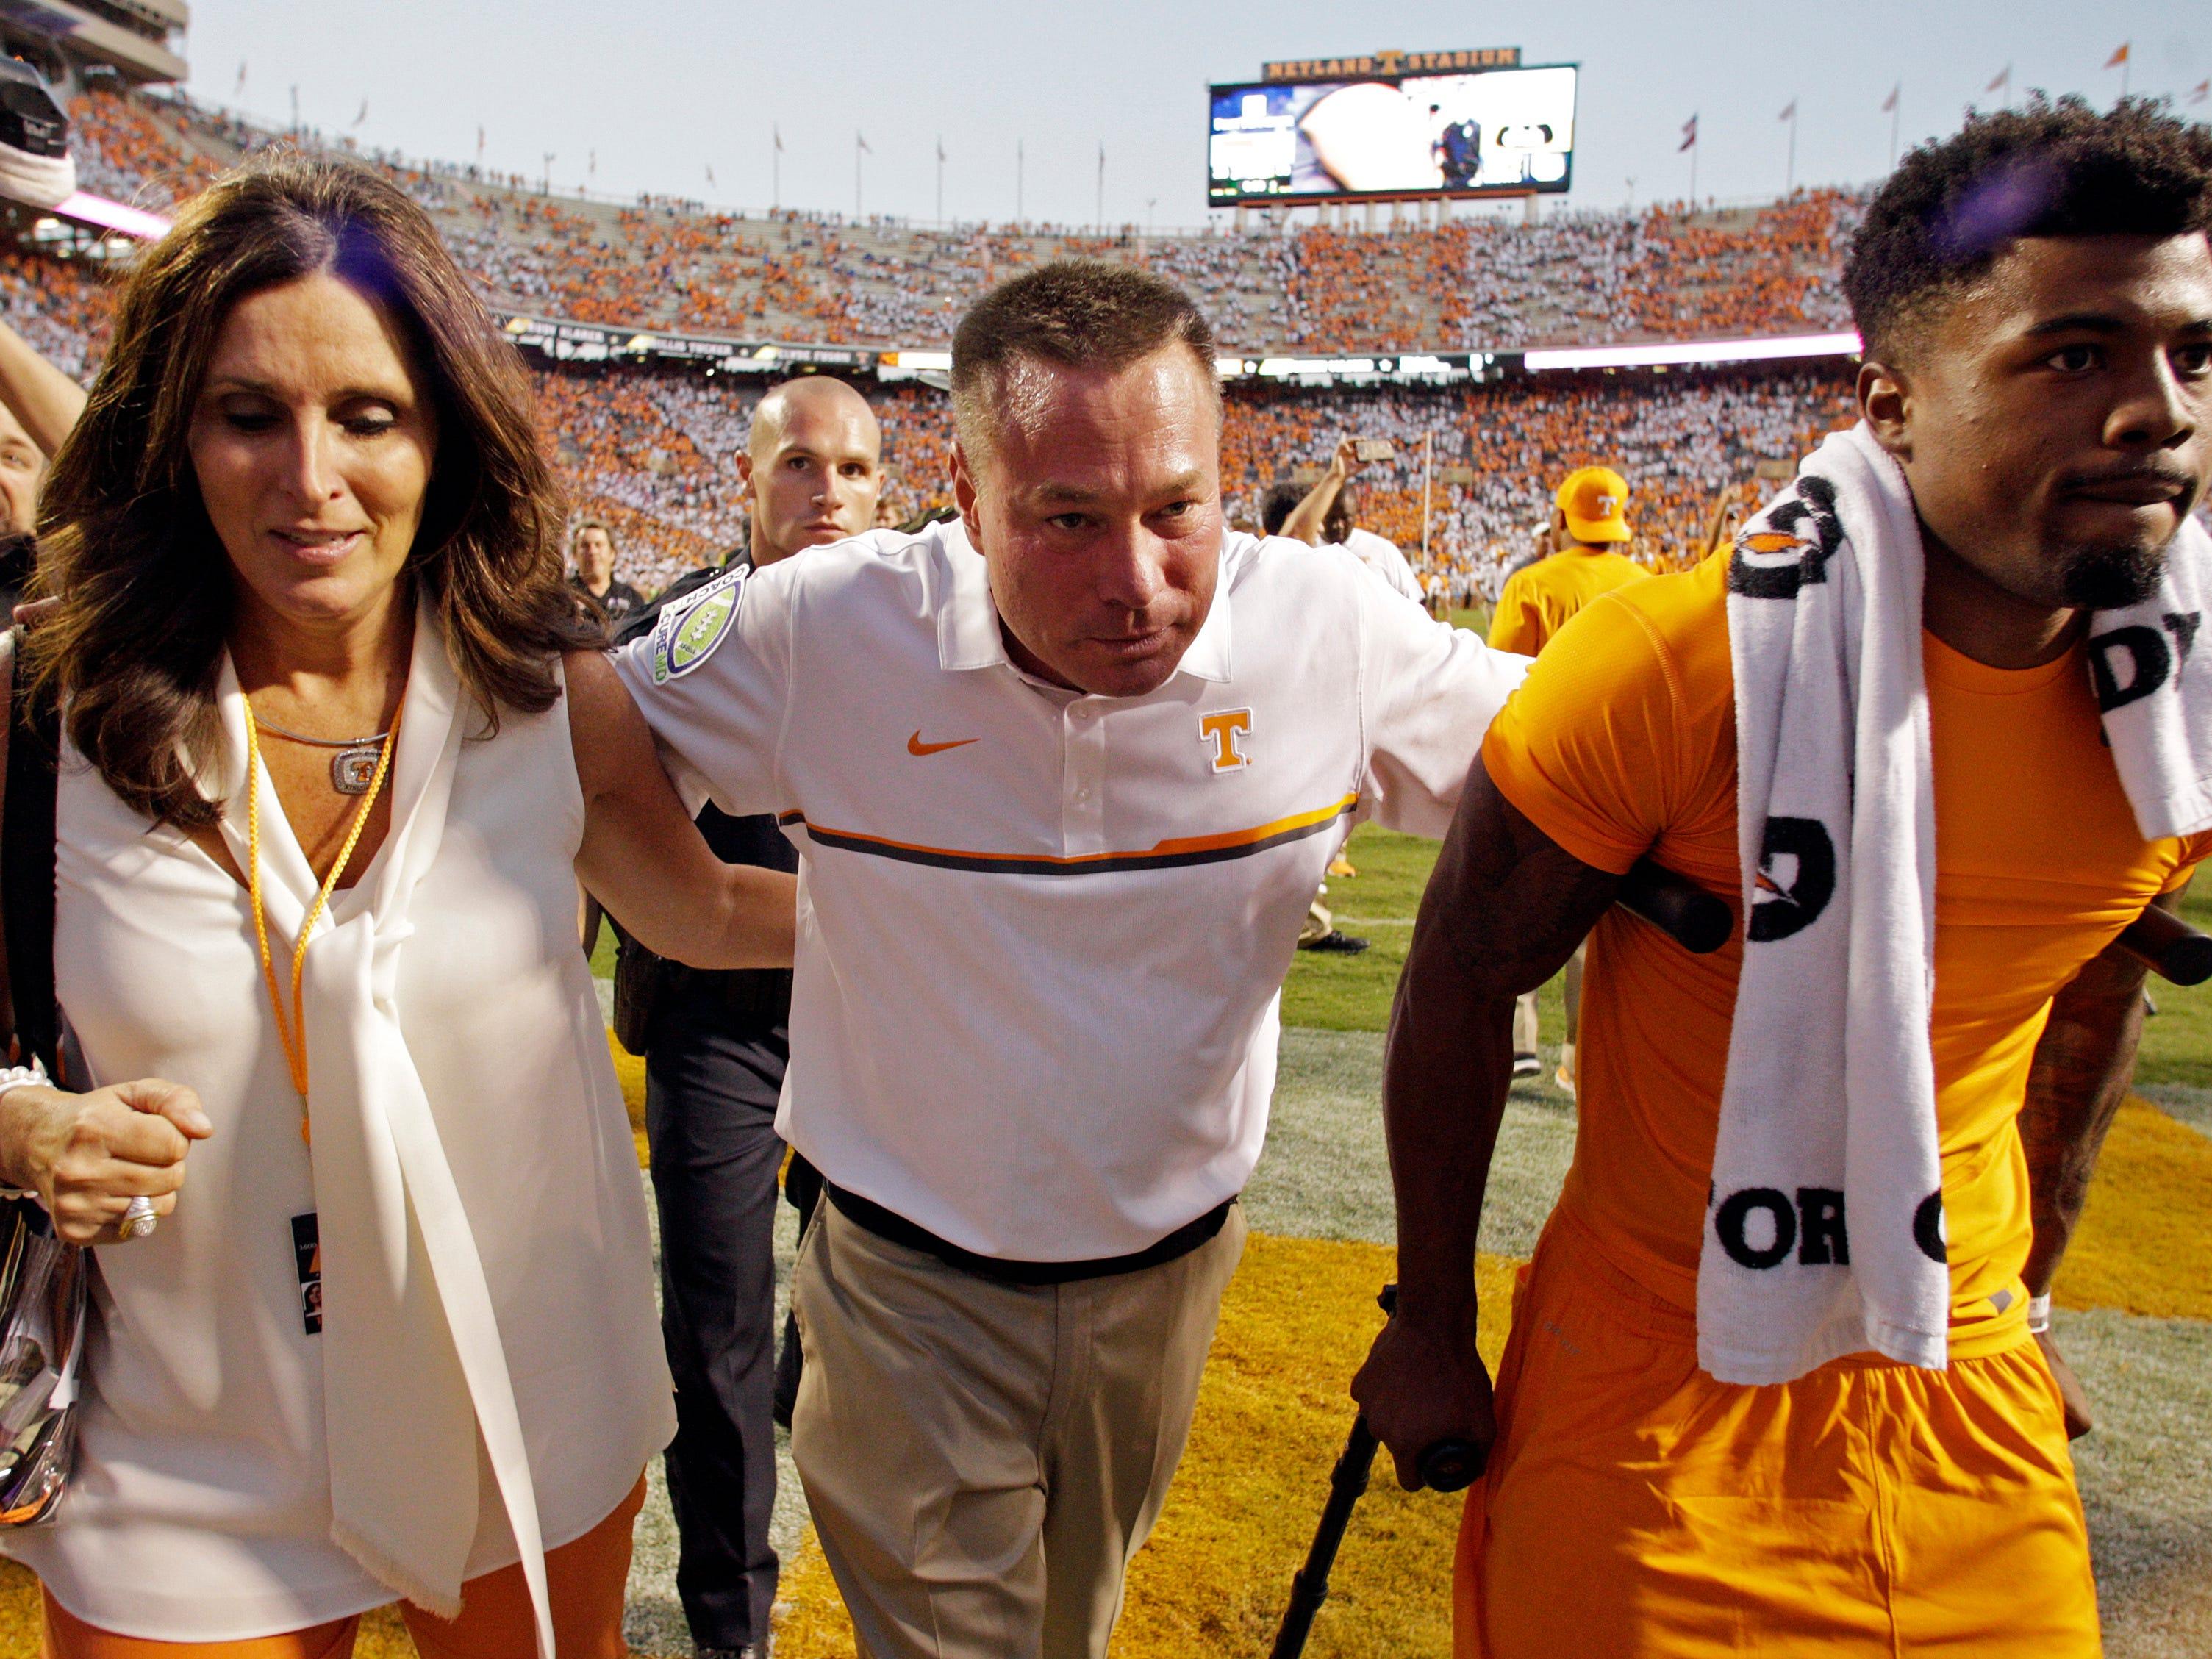 Jeremy Pruitt Wife >> Antone Davis email: Wife of former Vols coach Butch Jones spread false info about me | USA TODAY ...